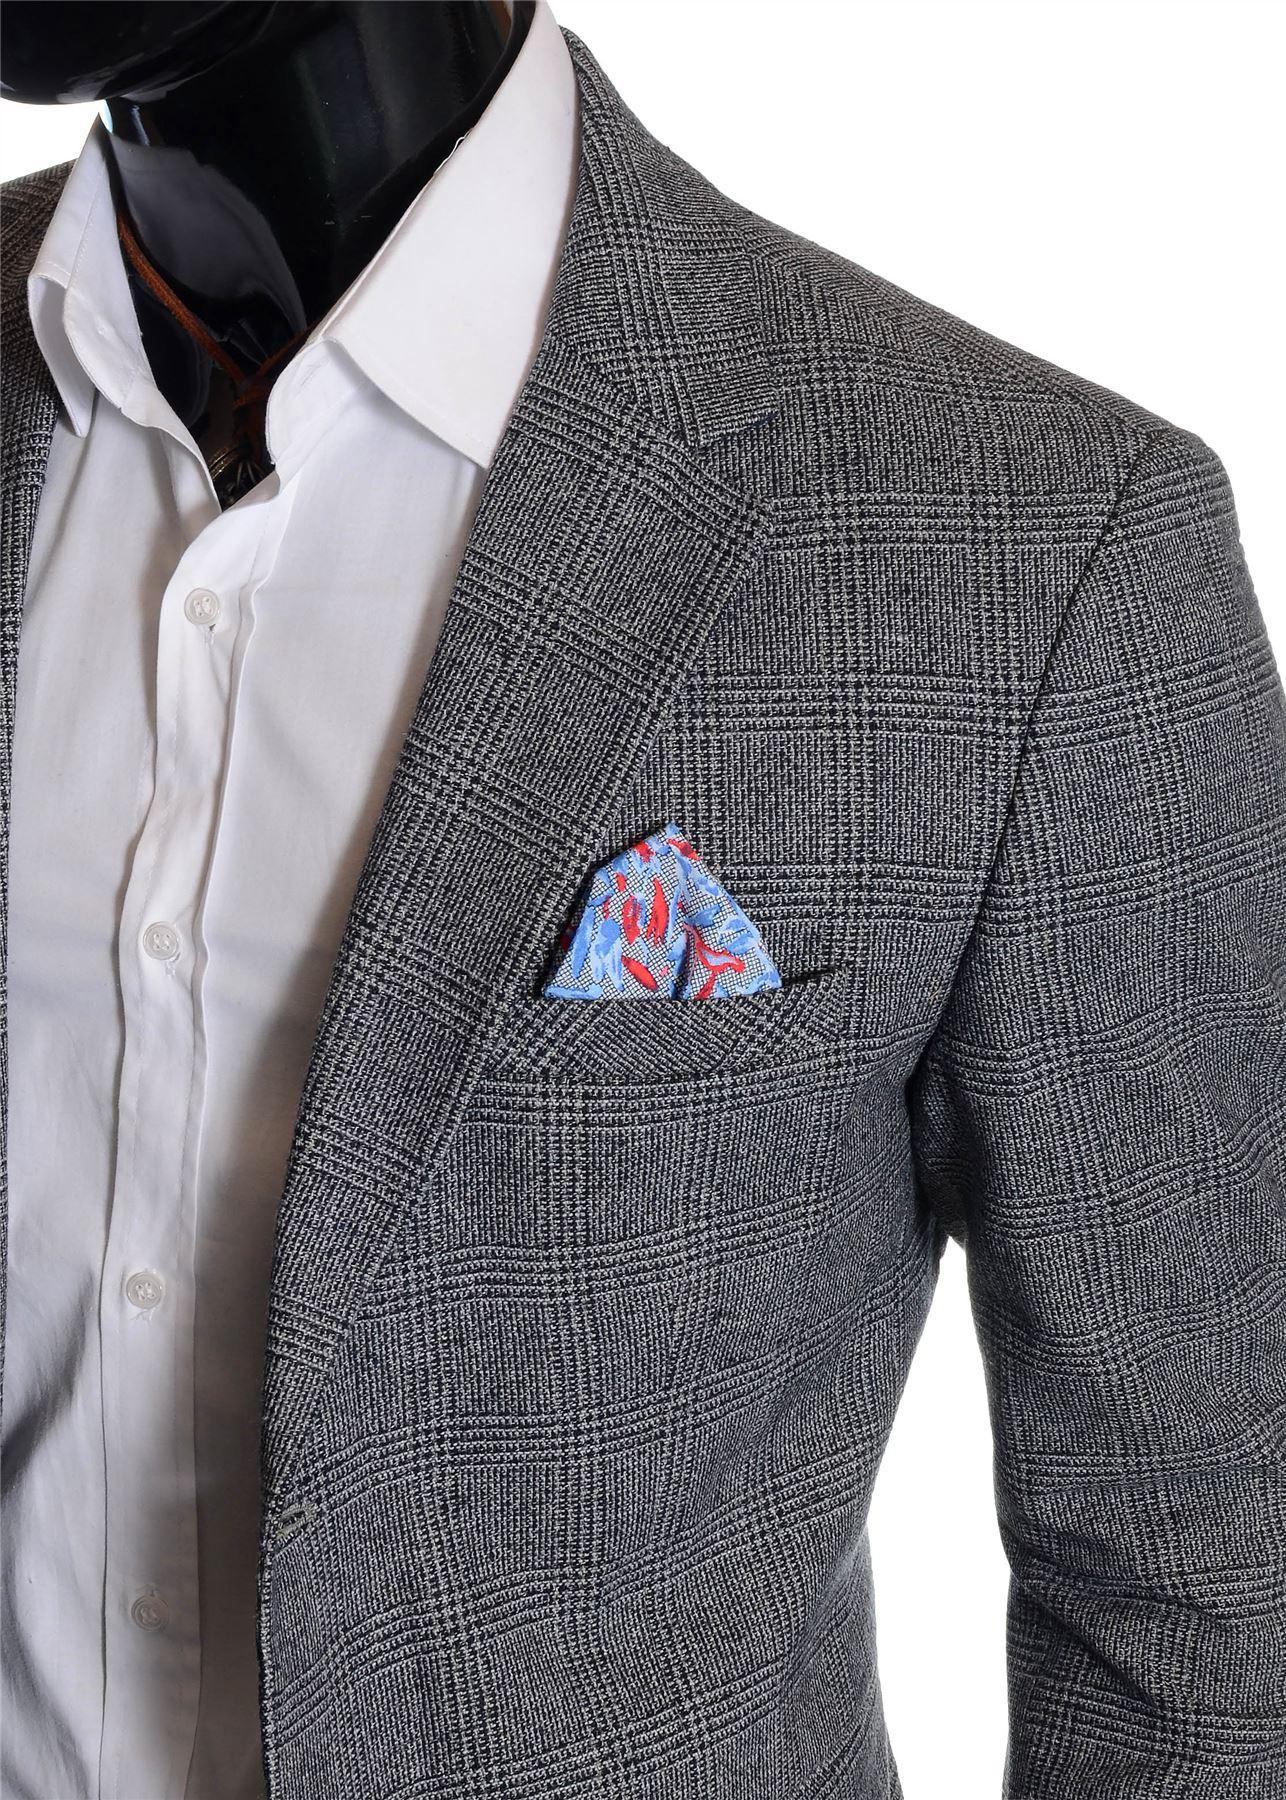 Men-039-s-Checkered-Coat-3-4-Long-Tweed-Cashmere-Wool-Trendy-Formal-Winter-Overcoat thumbnail 14